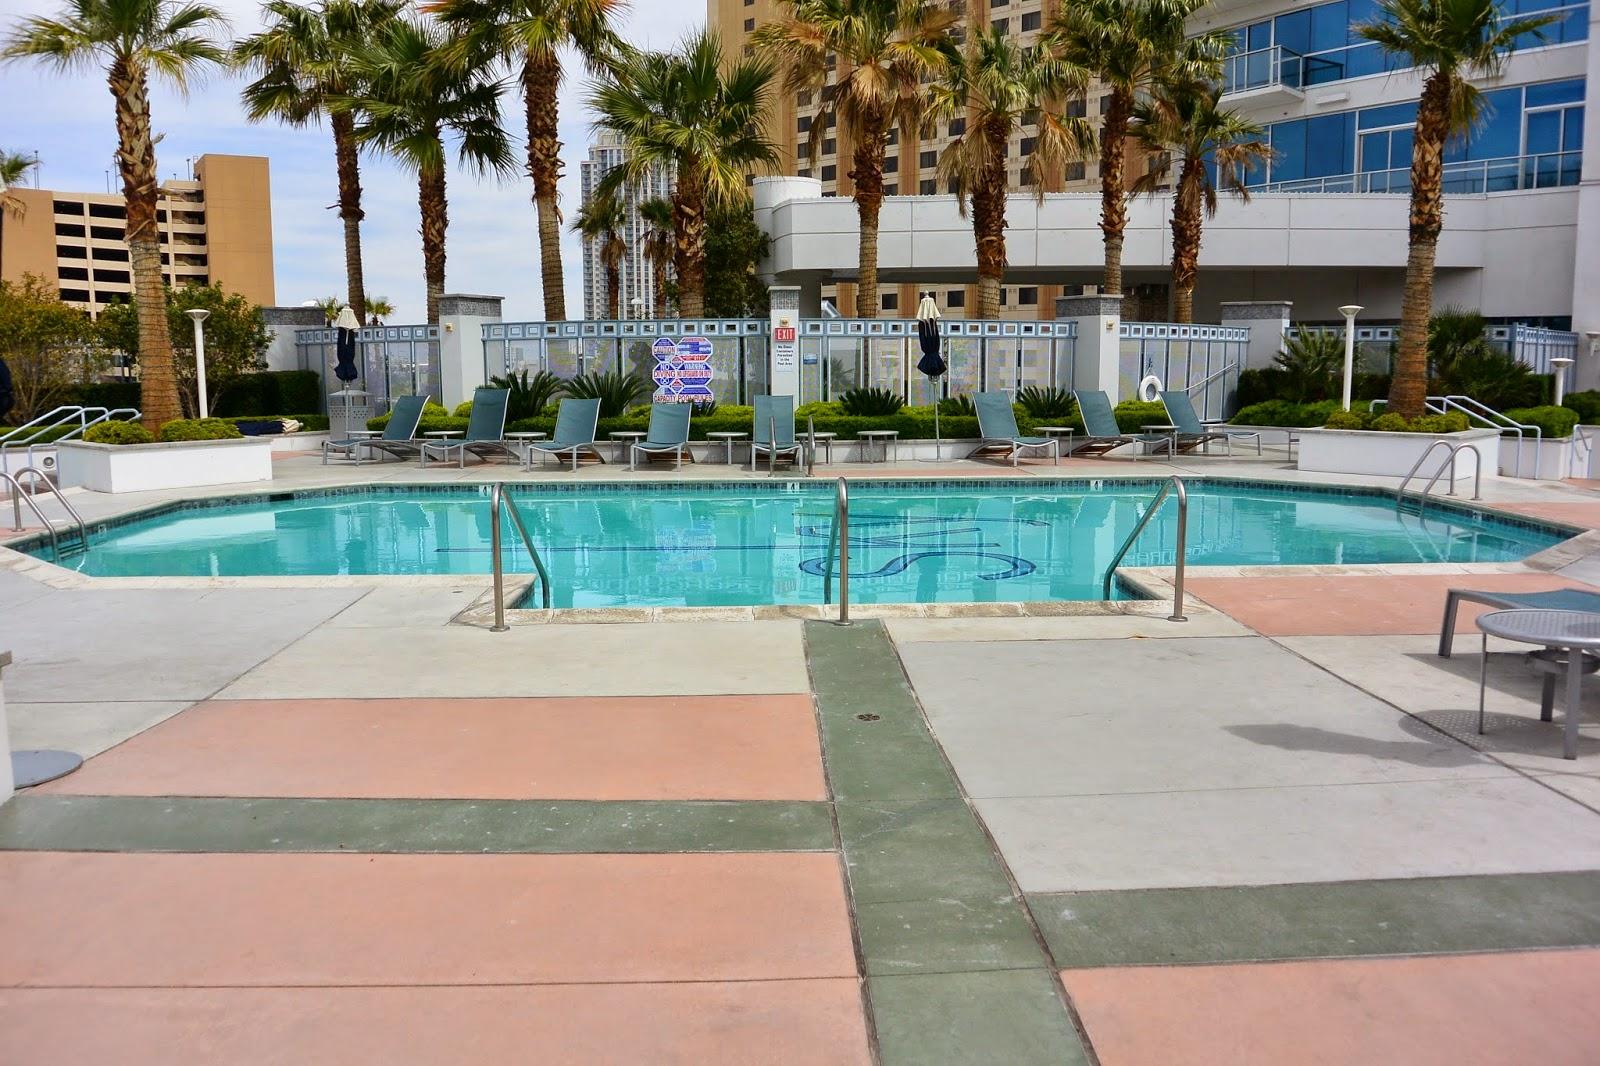 Las Vegas Condos For Sale For Rent - Top Vegas Condos